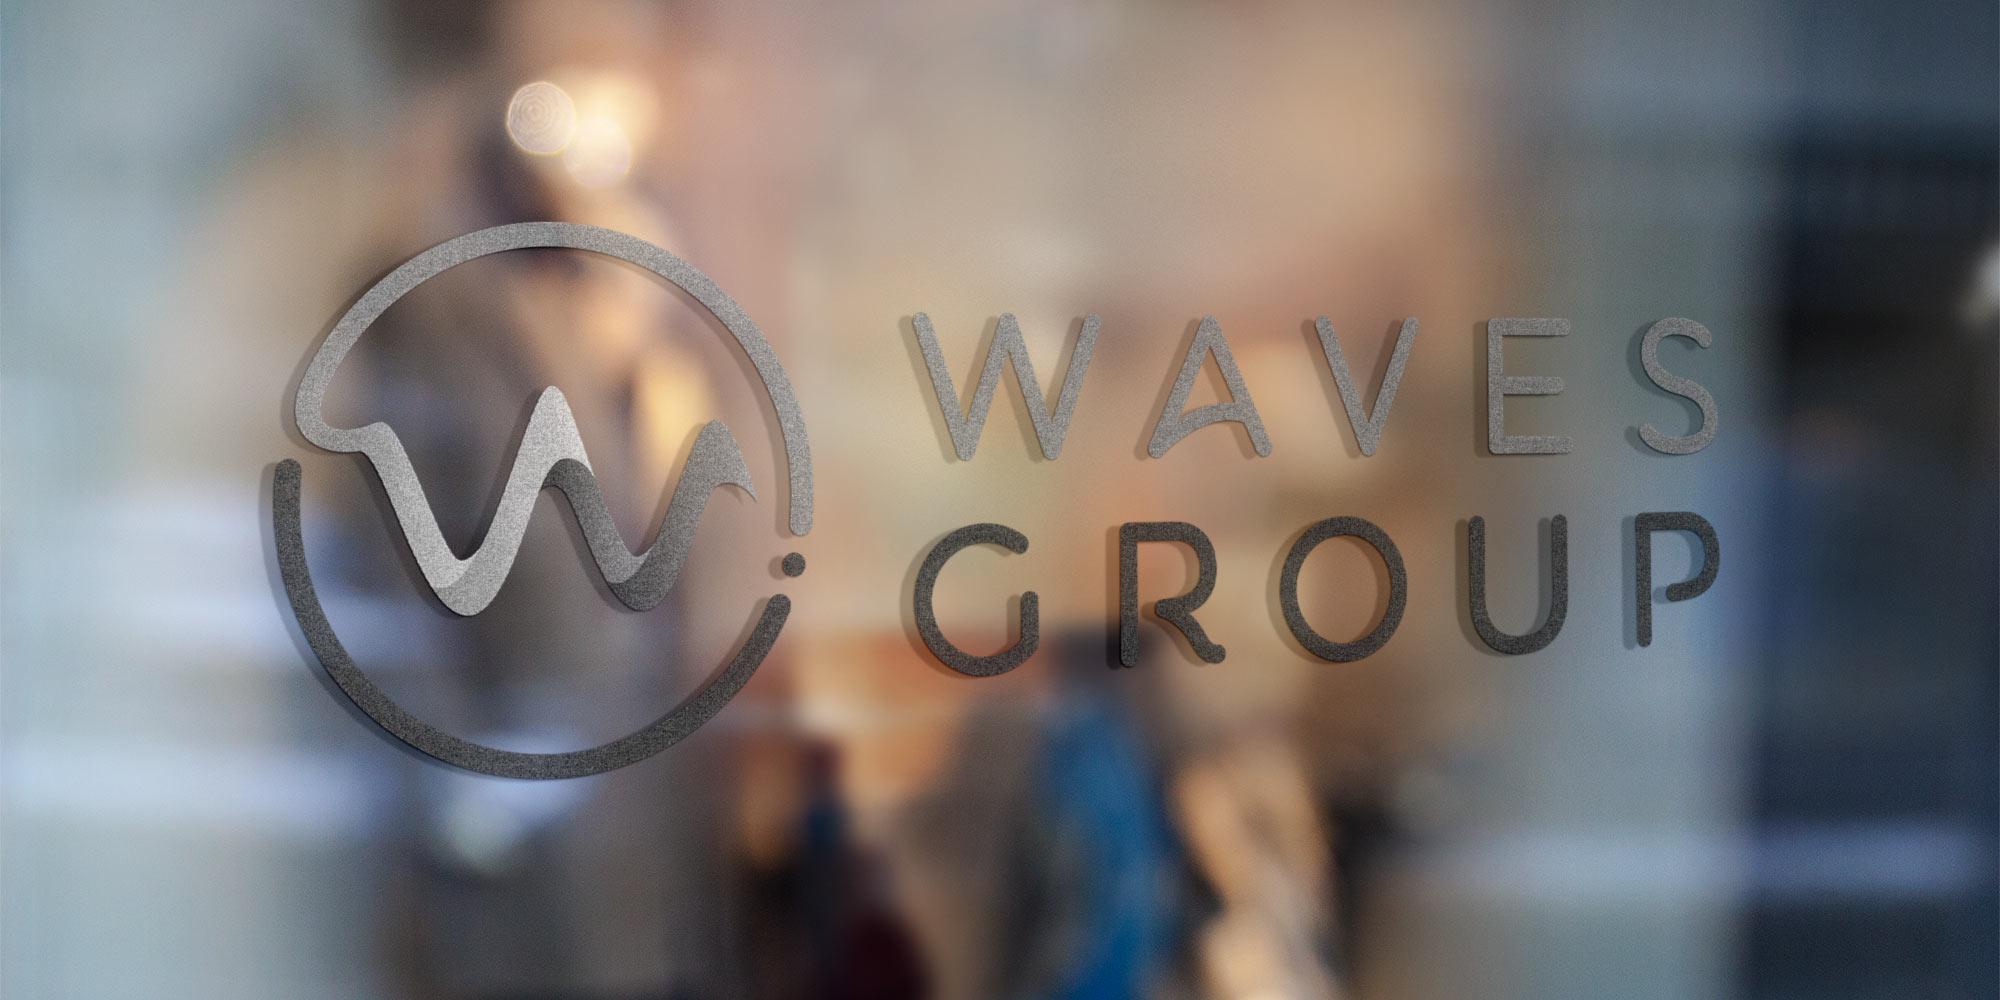 Waves Group Logo Design on Glass